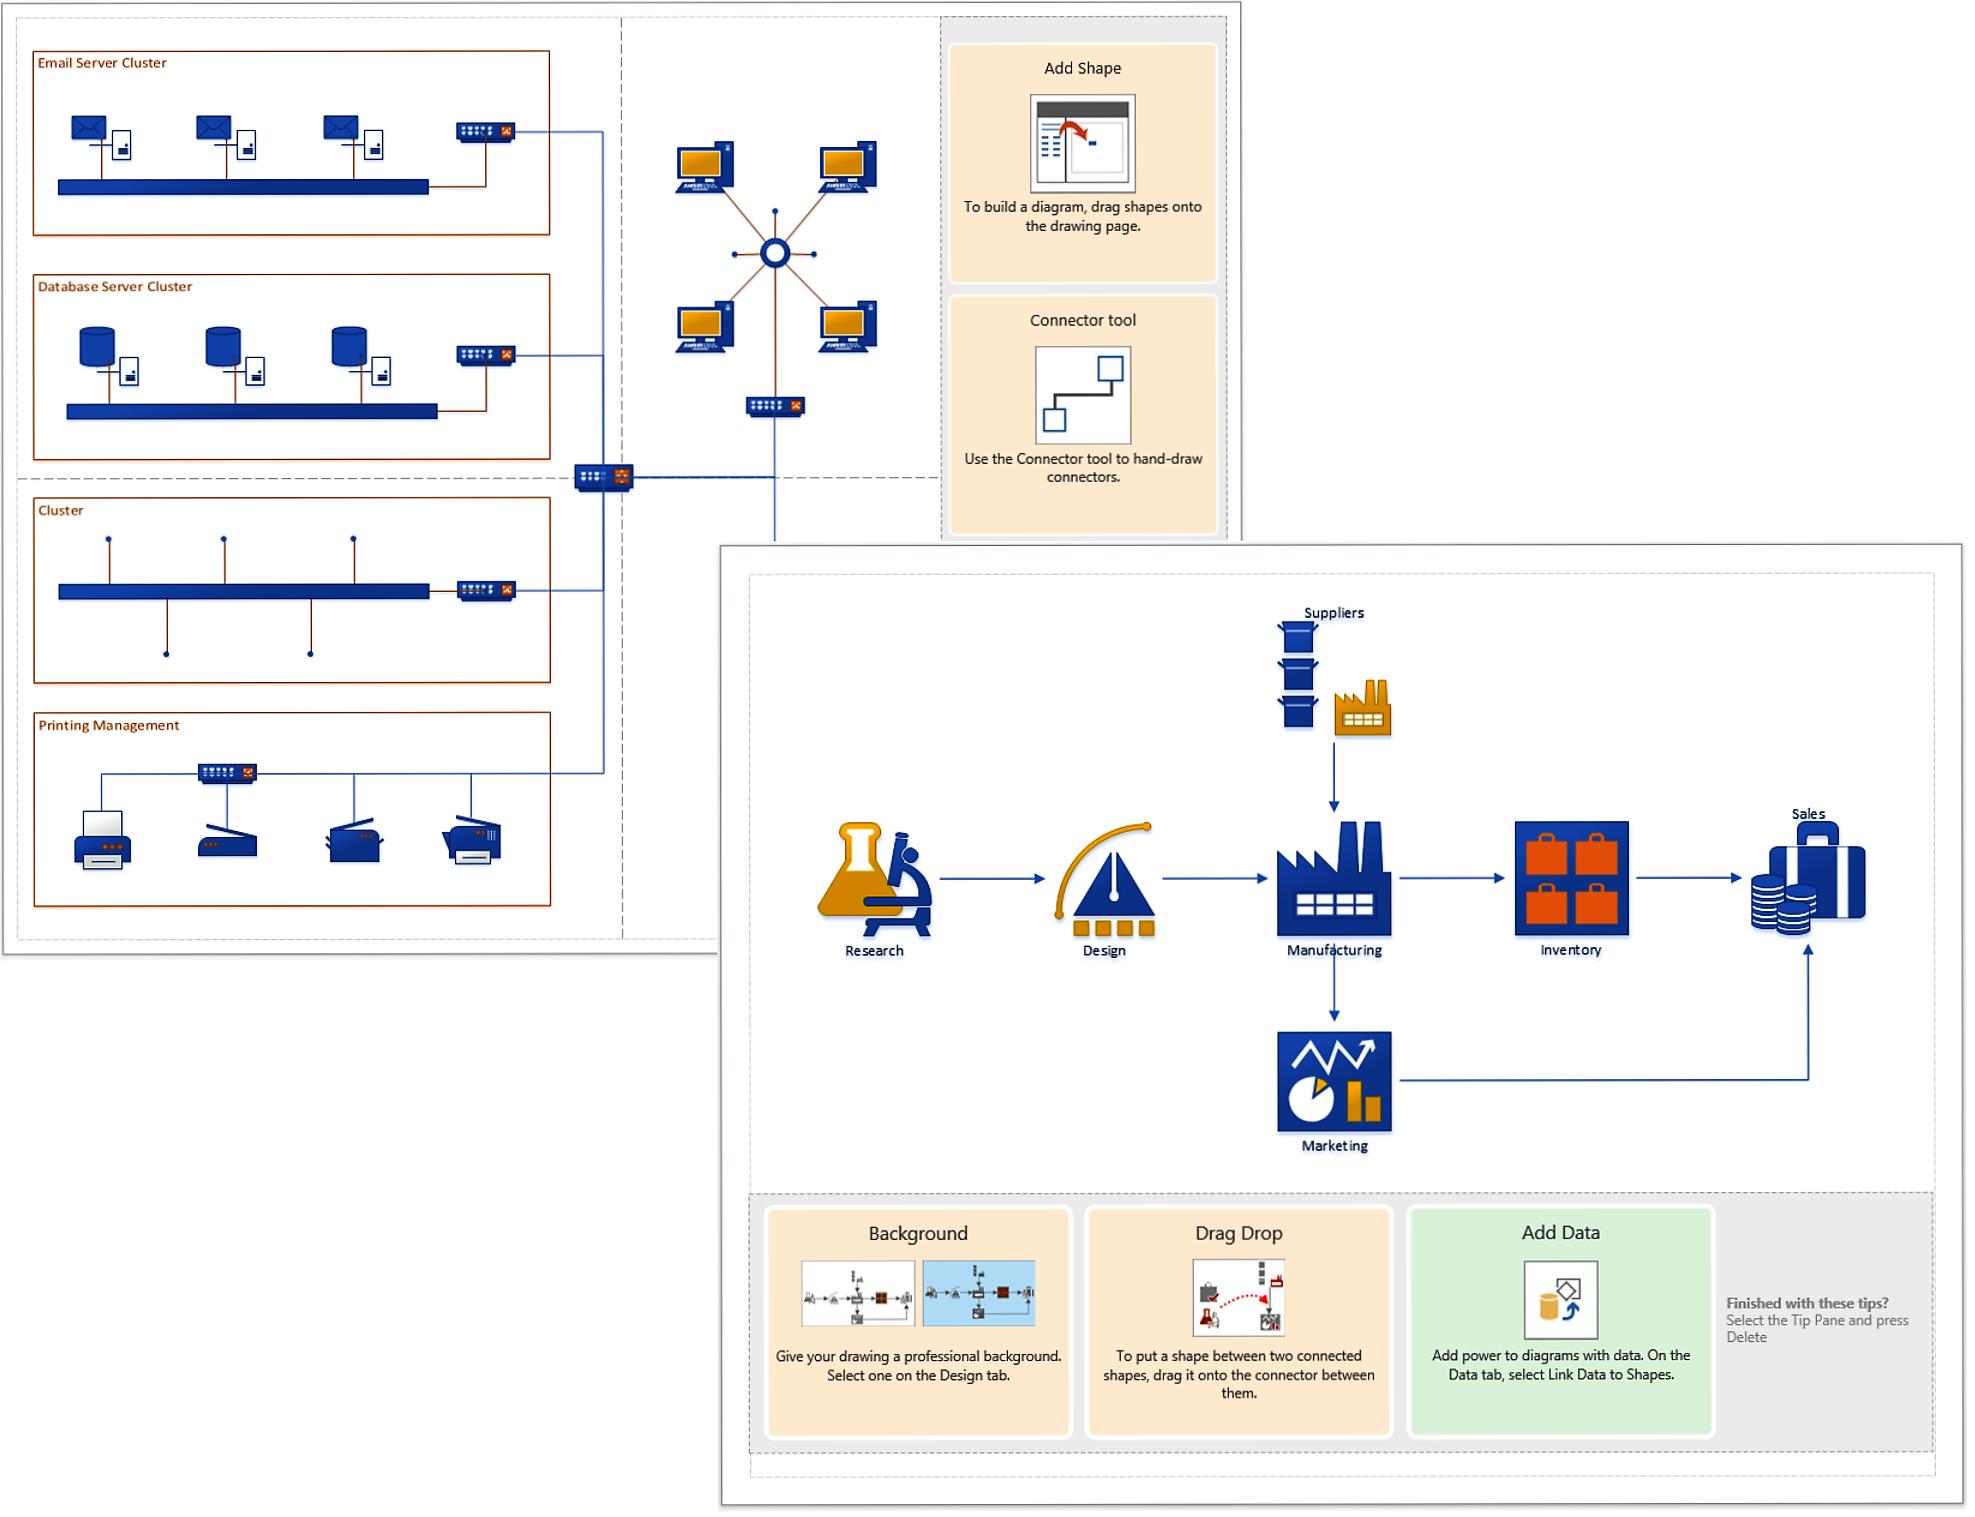 19 Automatic Visio 2013 Network Diagram Examples Download Technique Http Bookingritzcarlton Info 19 Automat Diagram Design Data Flow Diagram Microsoft Visio